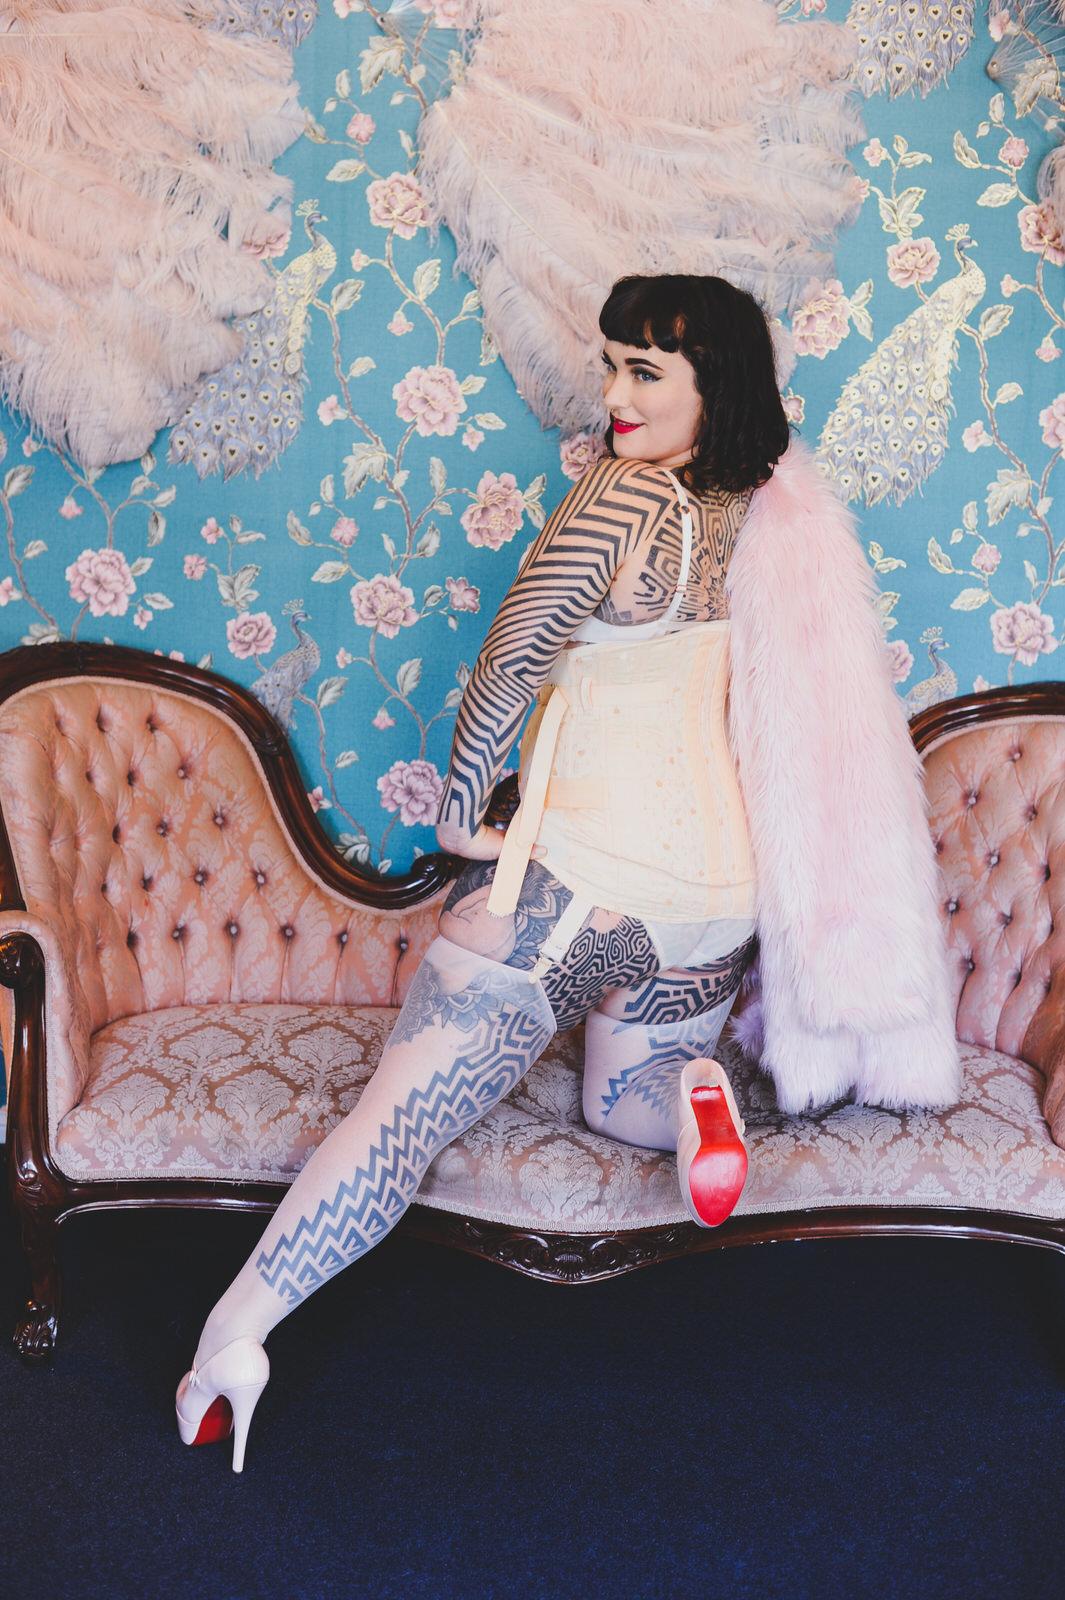 Tallula Darling tattooed escort sydney kinky gfe vintage glamour social date.jpg